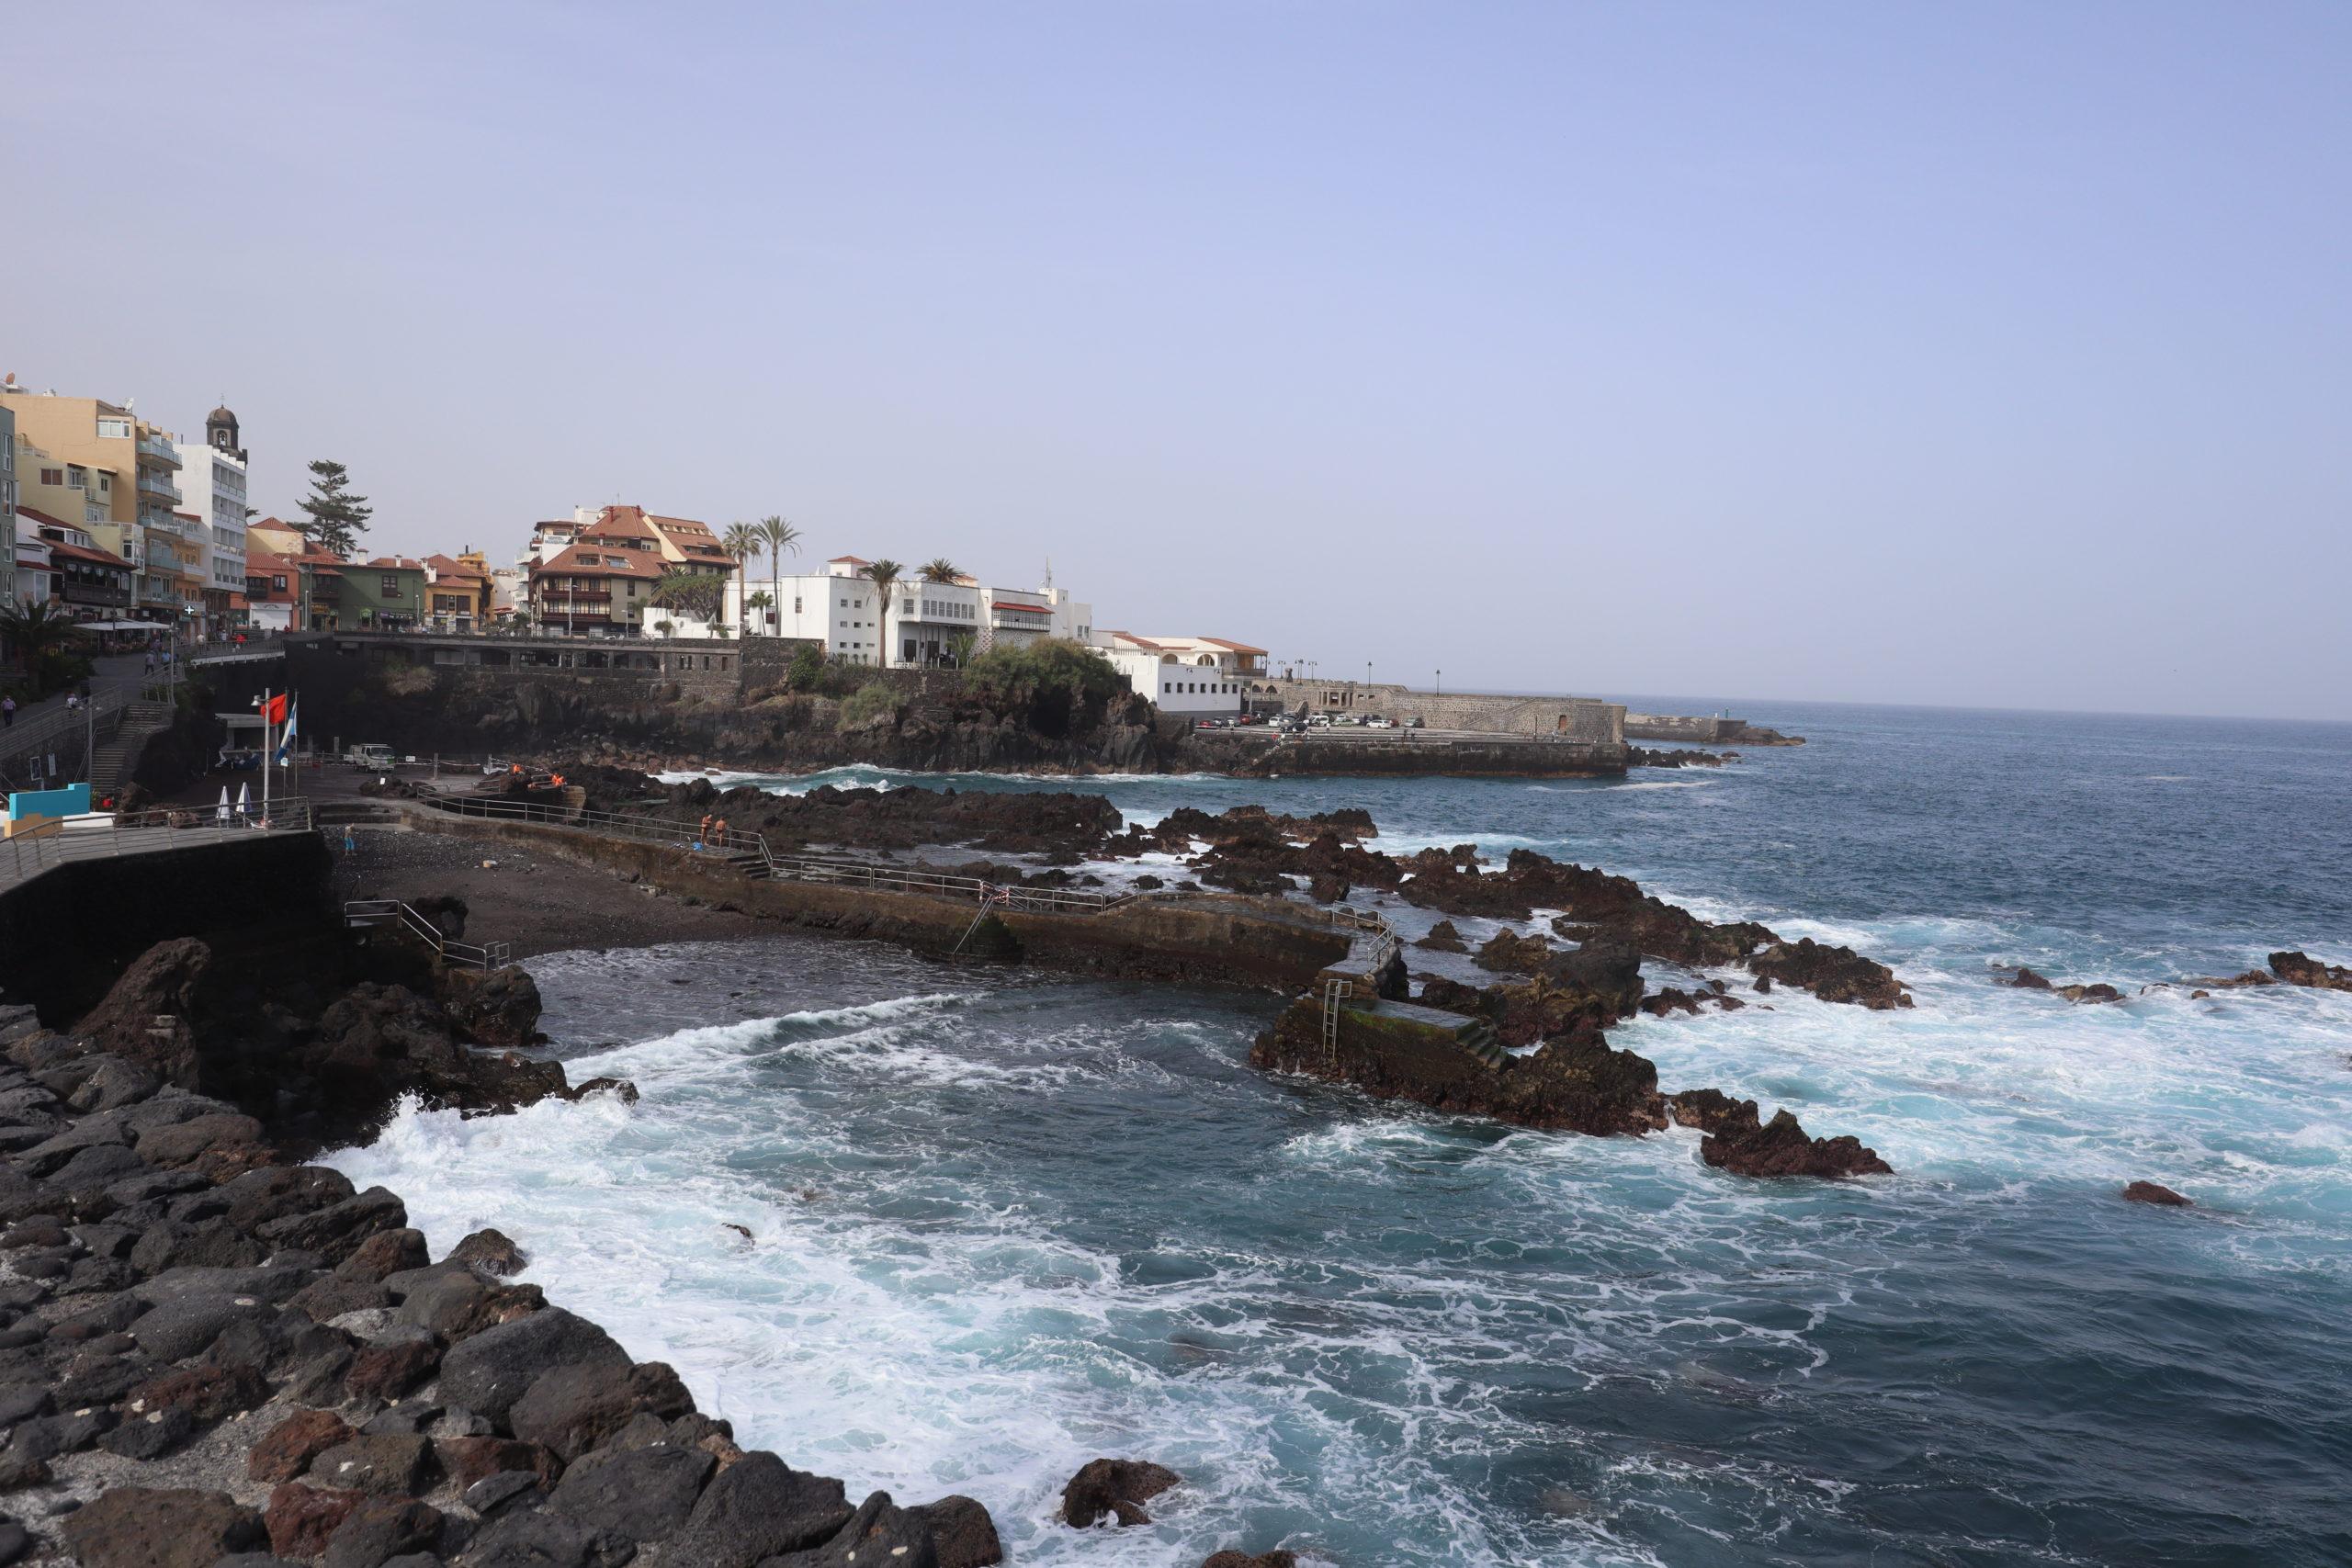 playa-san-telmo-puerto-cruz